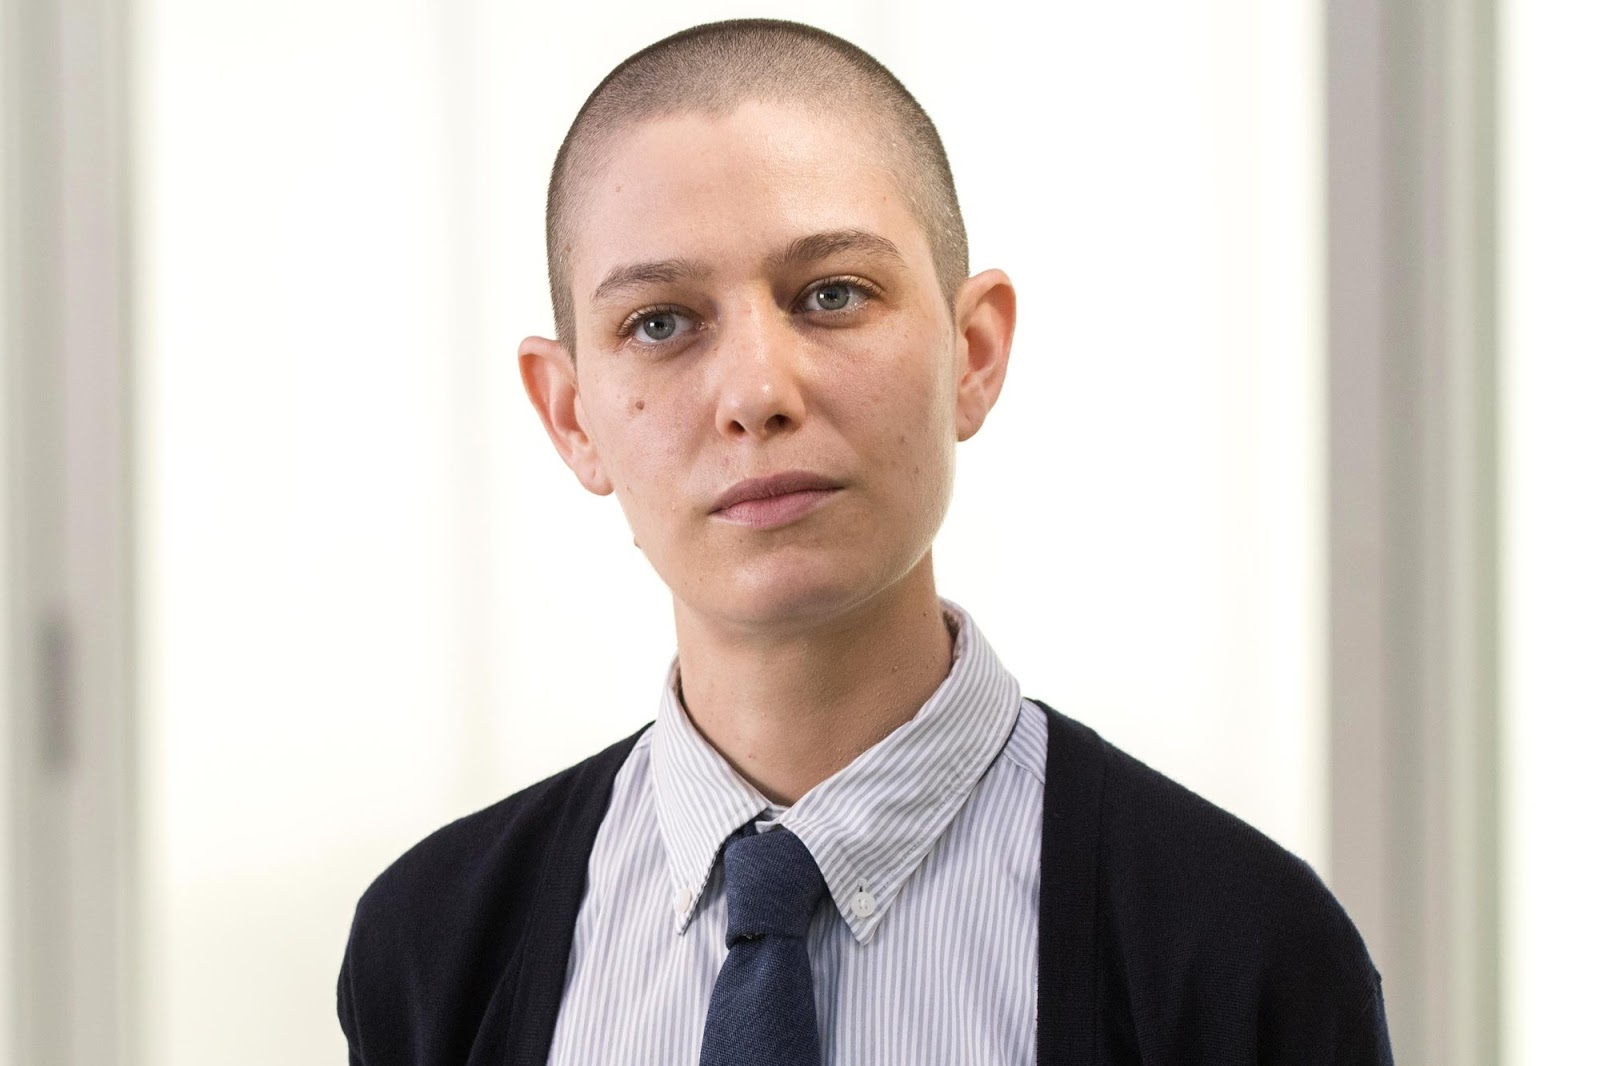 Asia Kate Dillon personificando a Taylor Mason en Billions